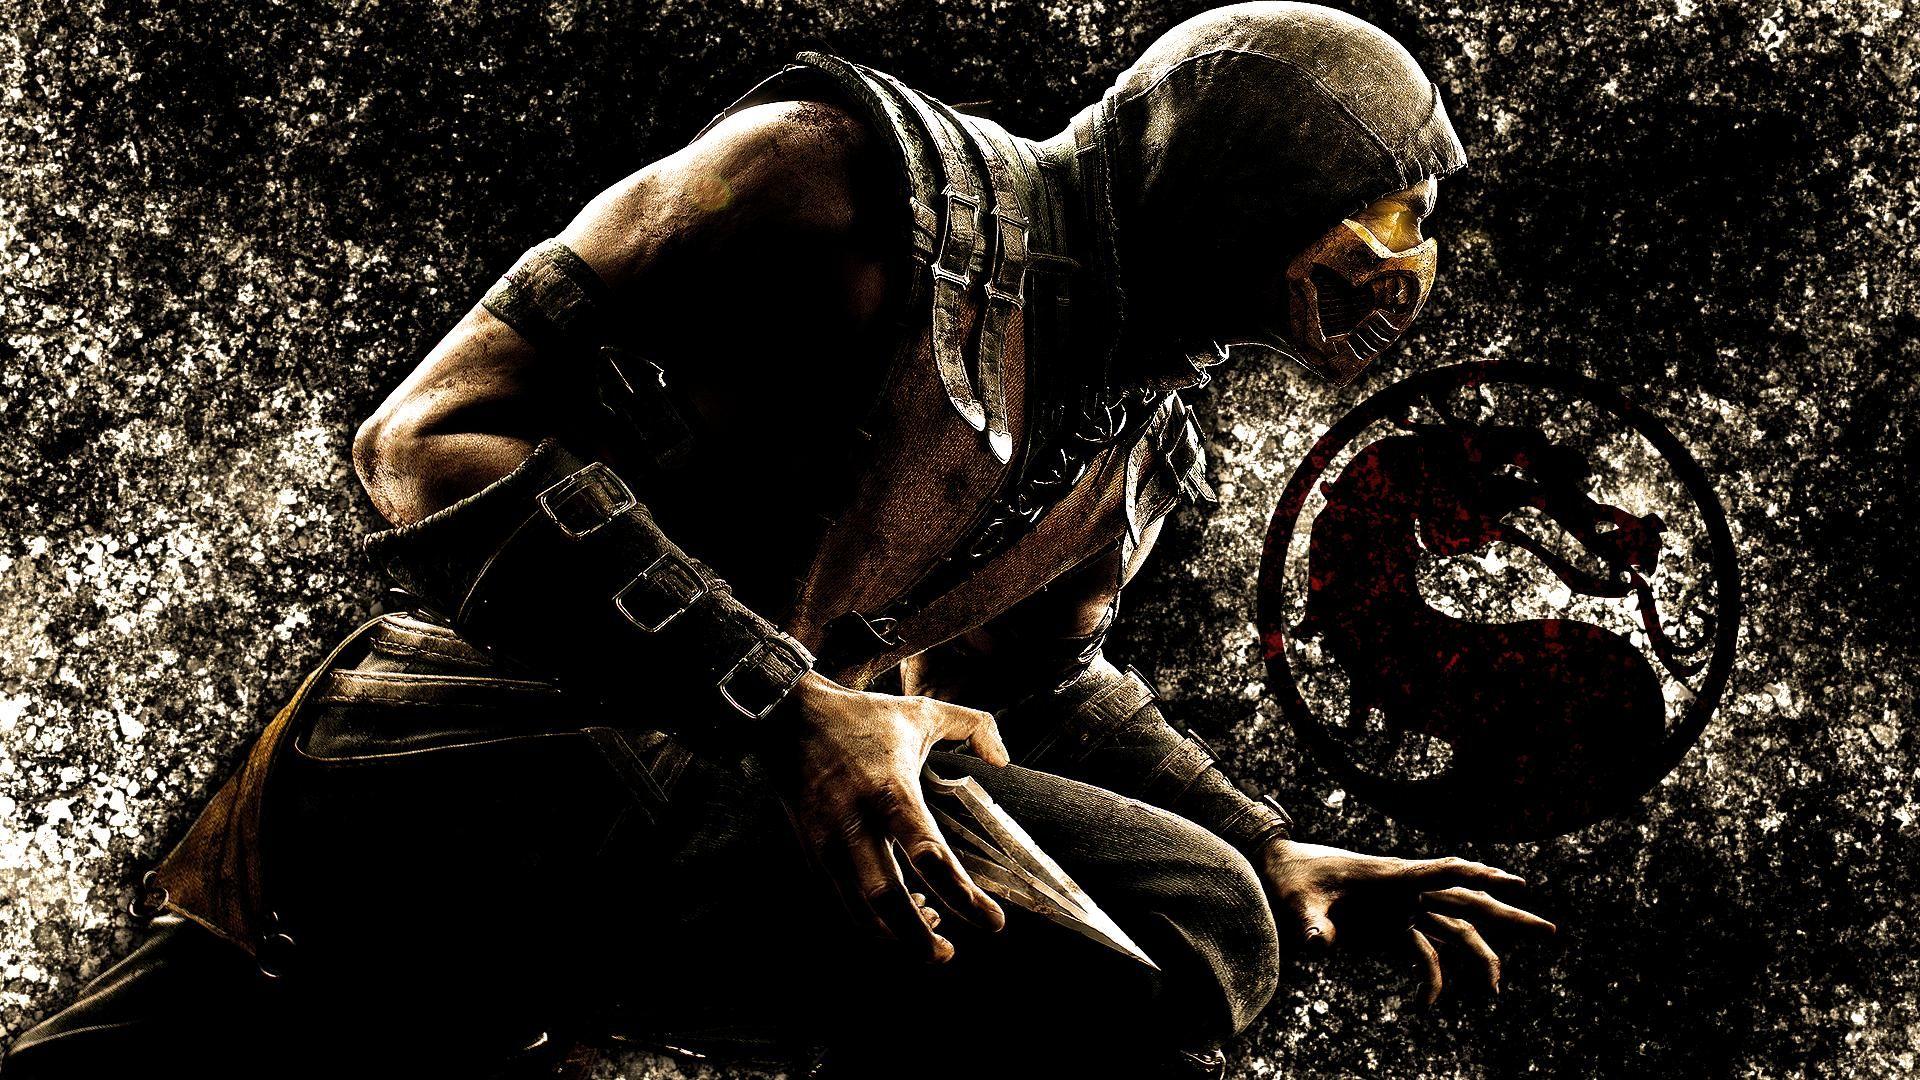 Mortal Kombat X Scorpion Wallpaper - Imgur